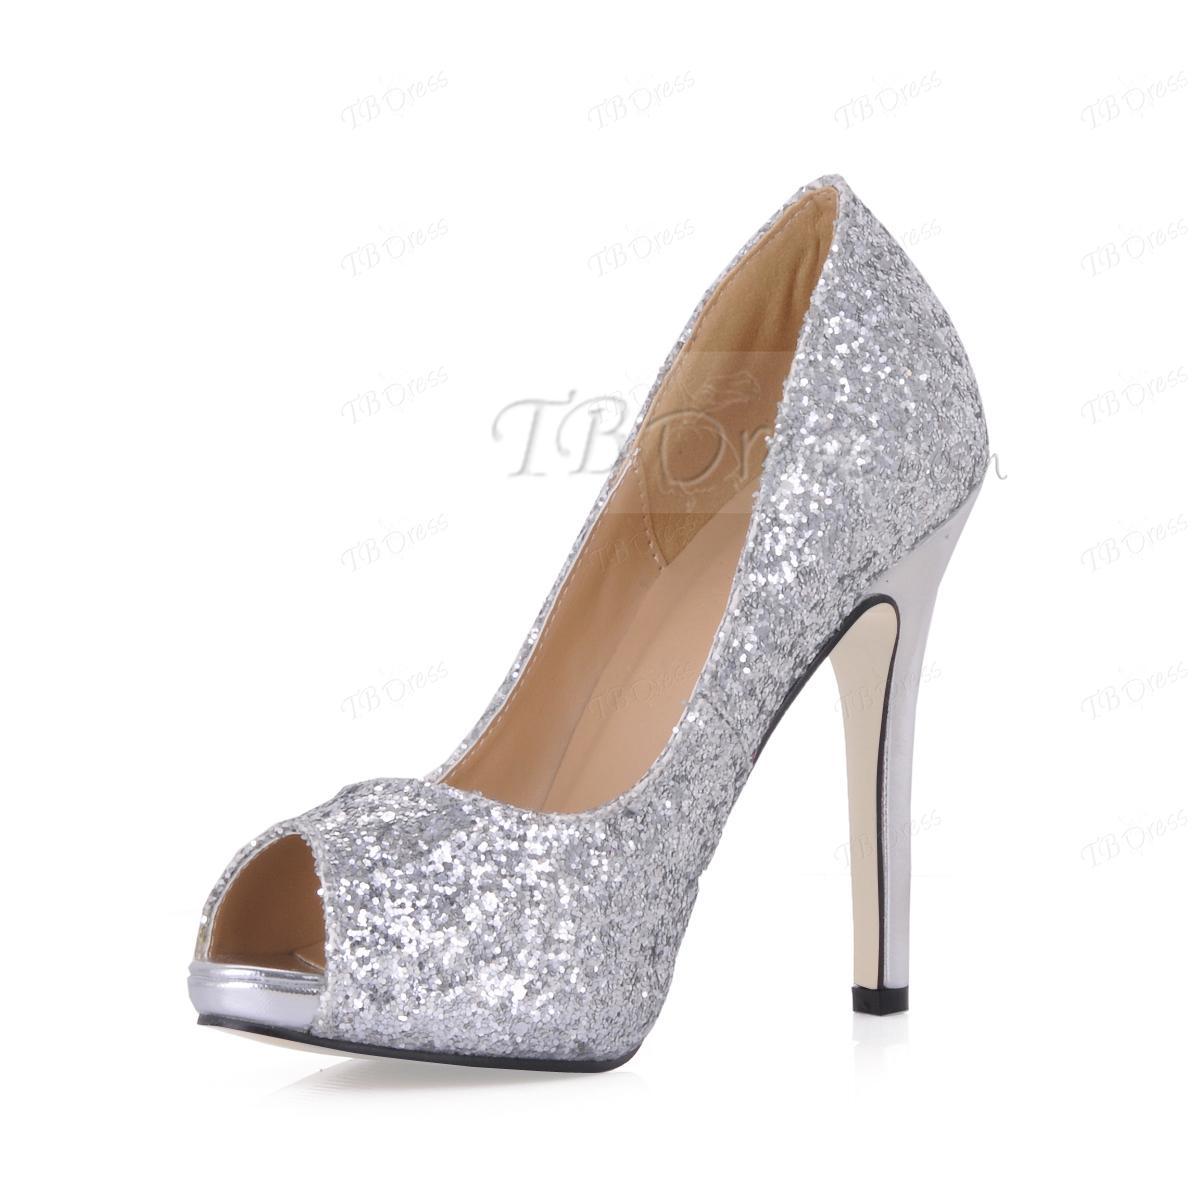 nice wedding shoes photo - 1